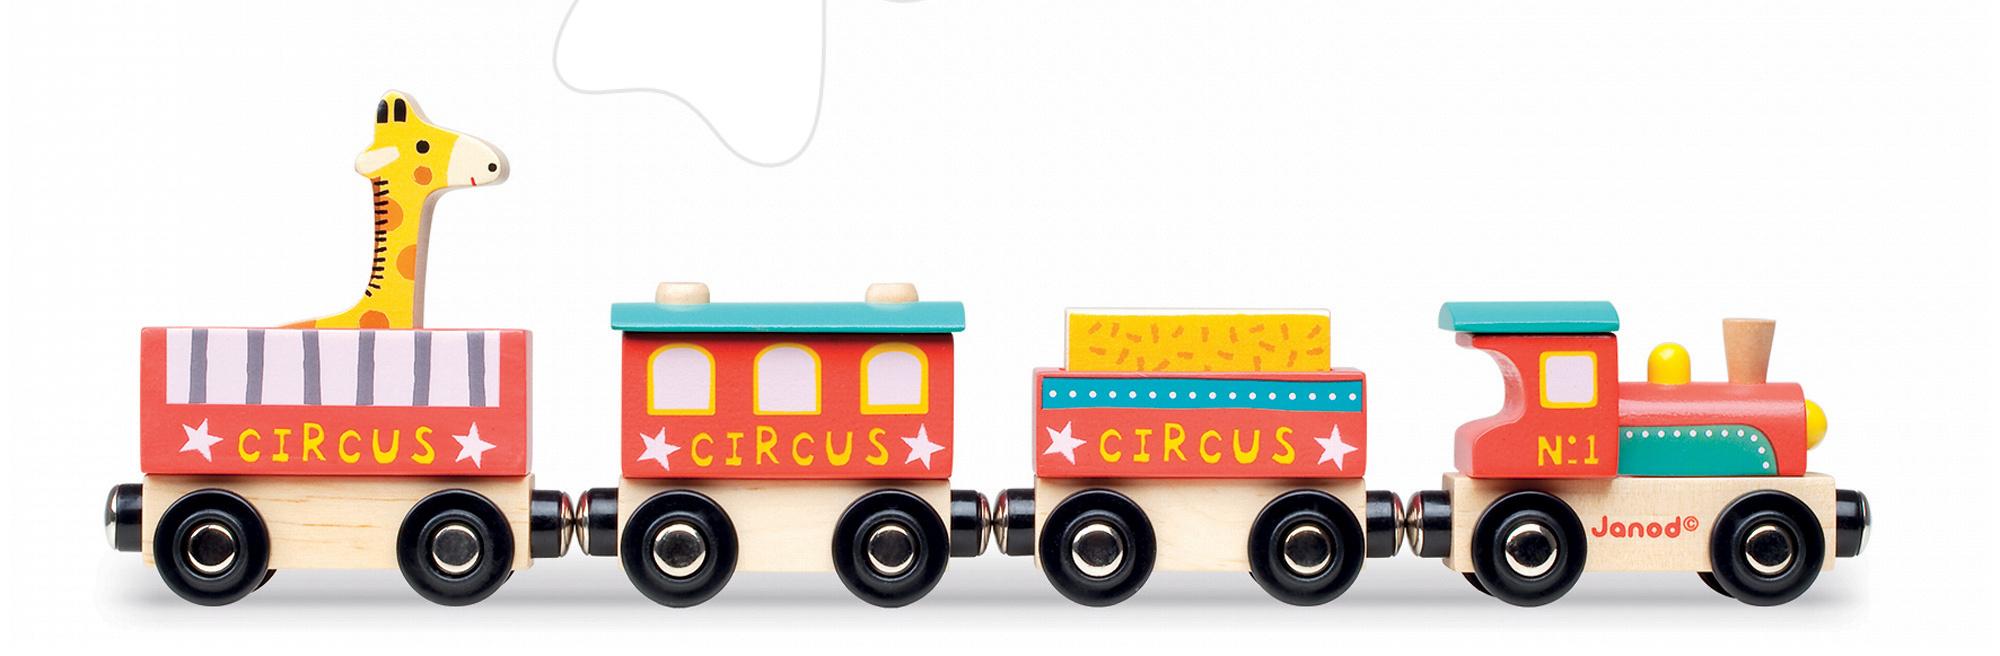 Poľnohospodárske stroje - Drevený magnetický vláčik Cirkus Story Set Janod so žirafou od 18 mes